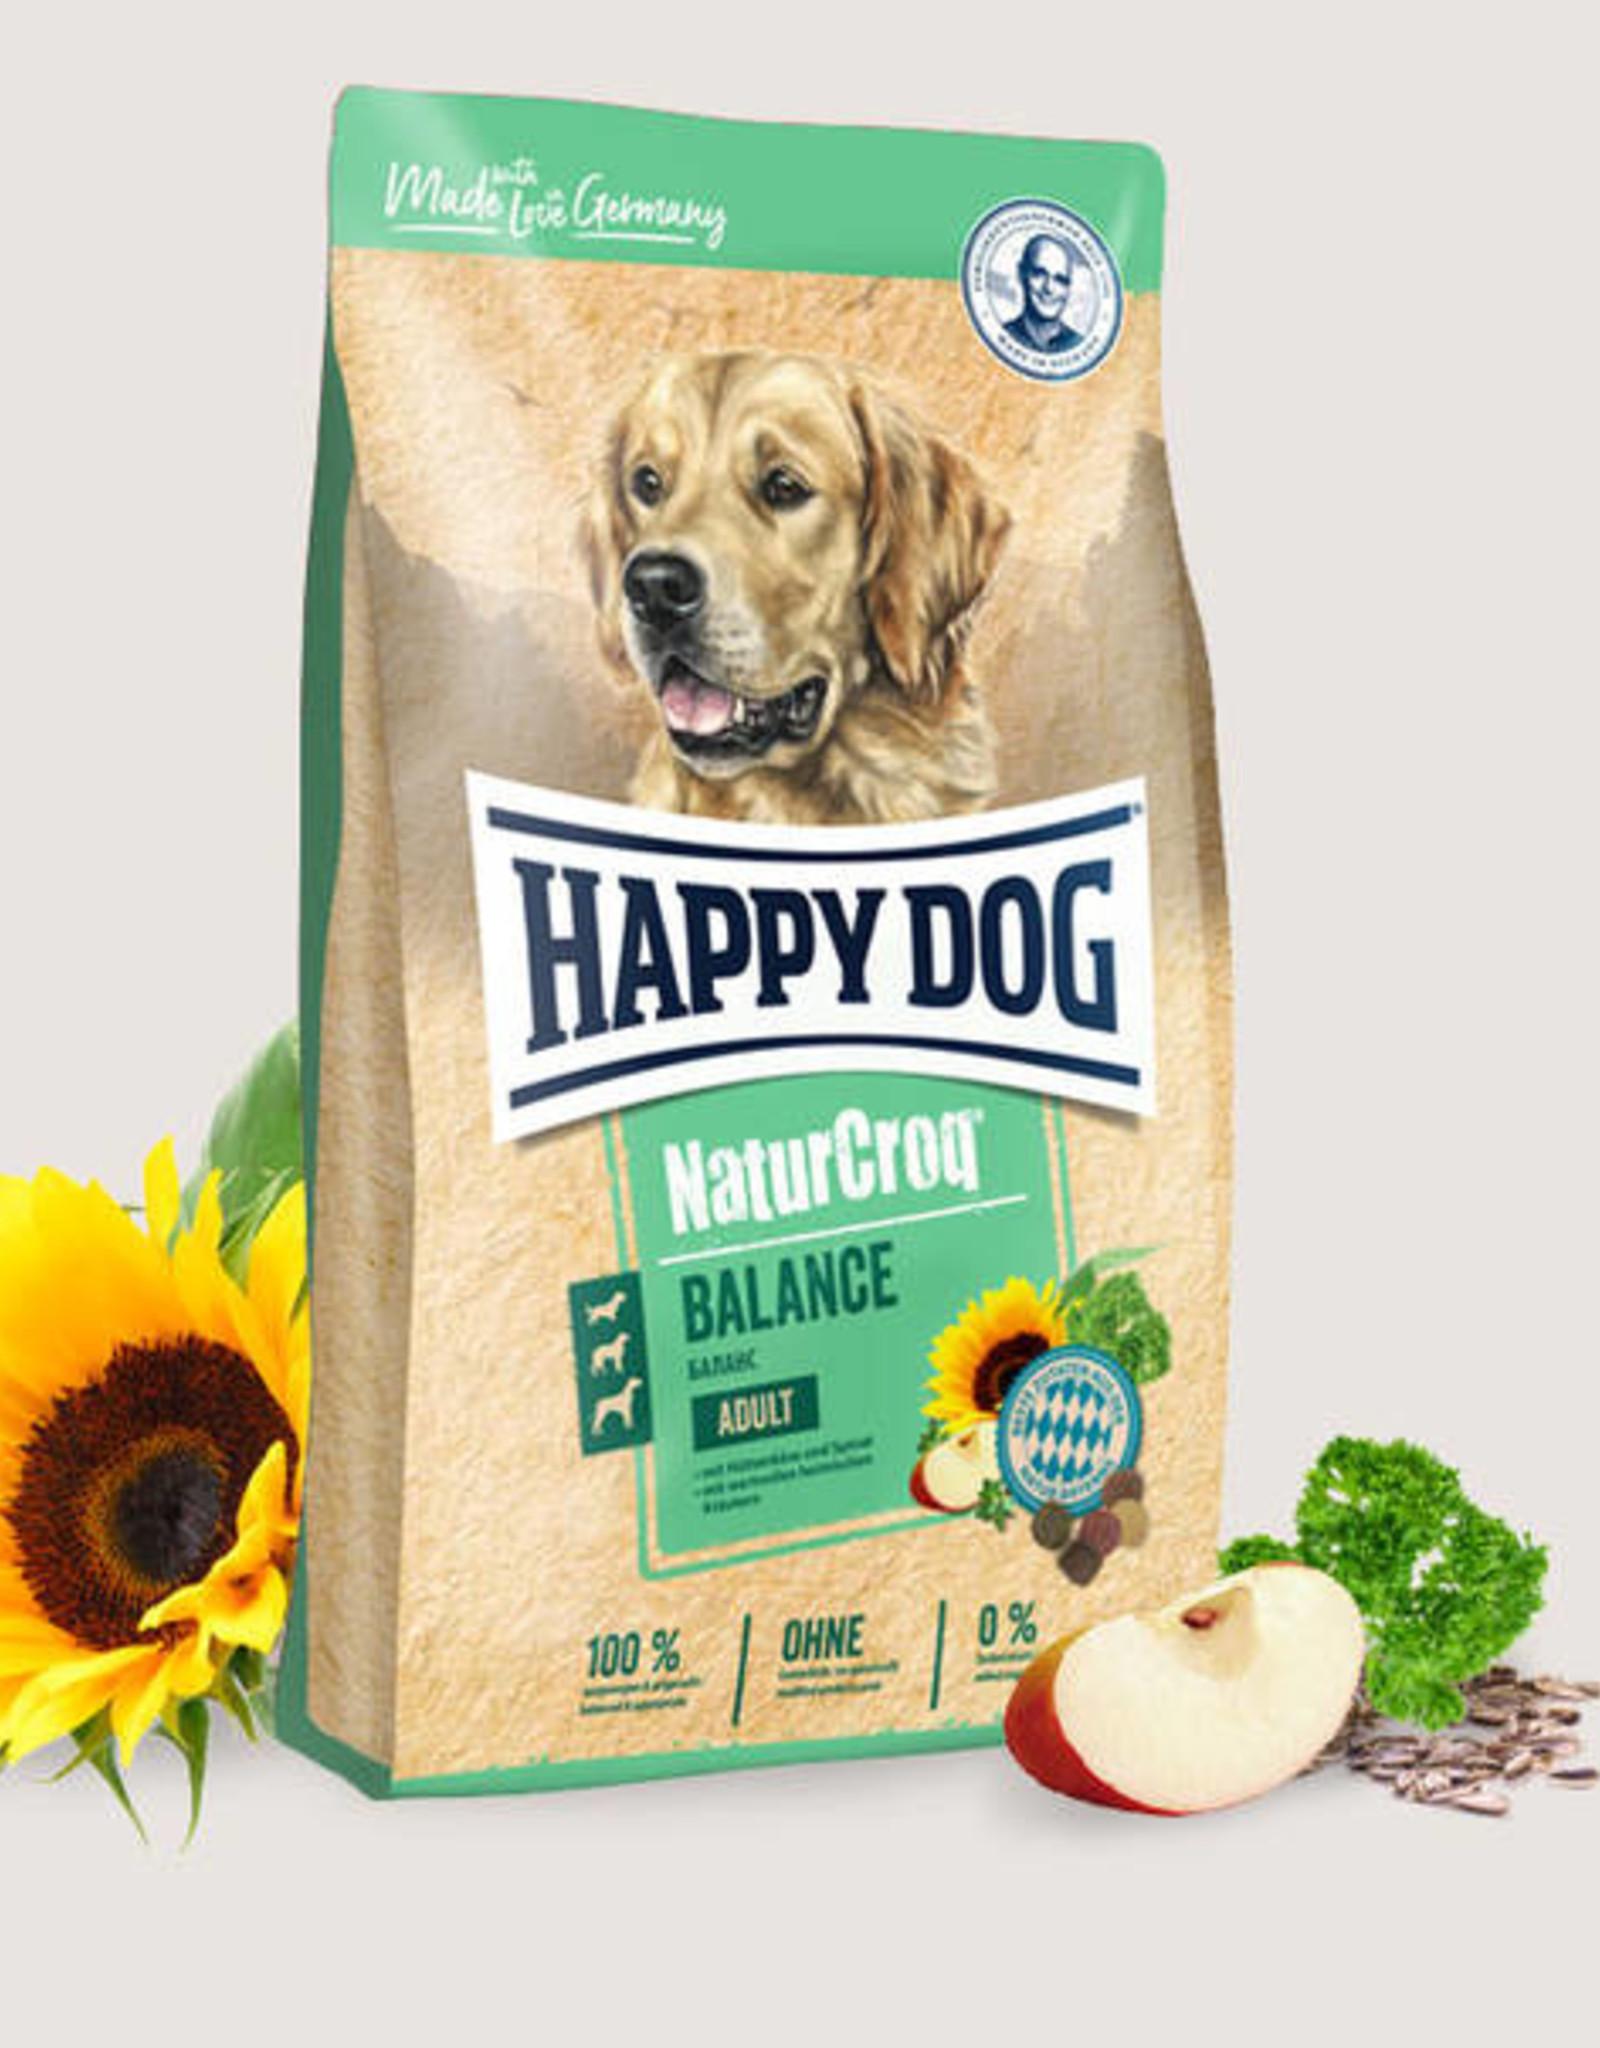 Happy Dog Premium - NaturCroq Balance